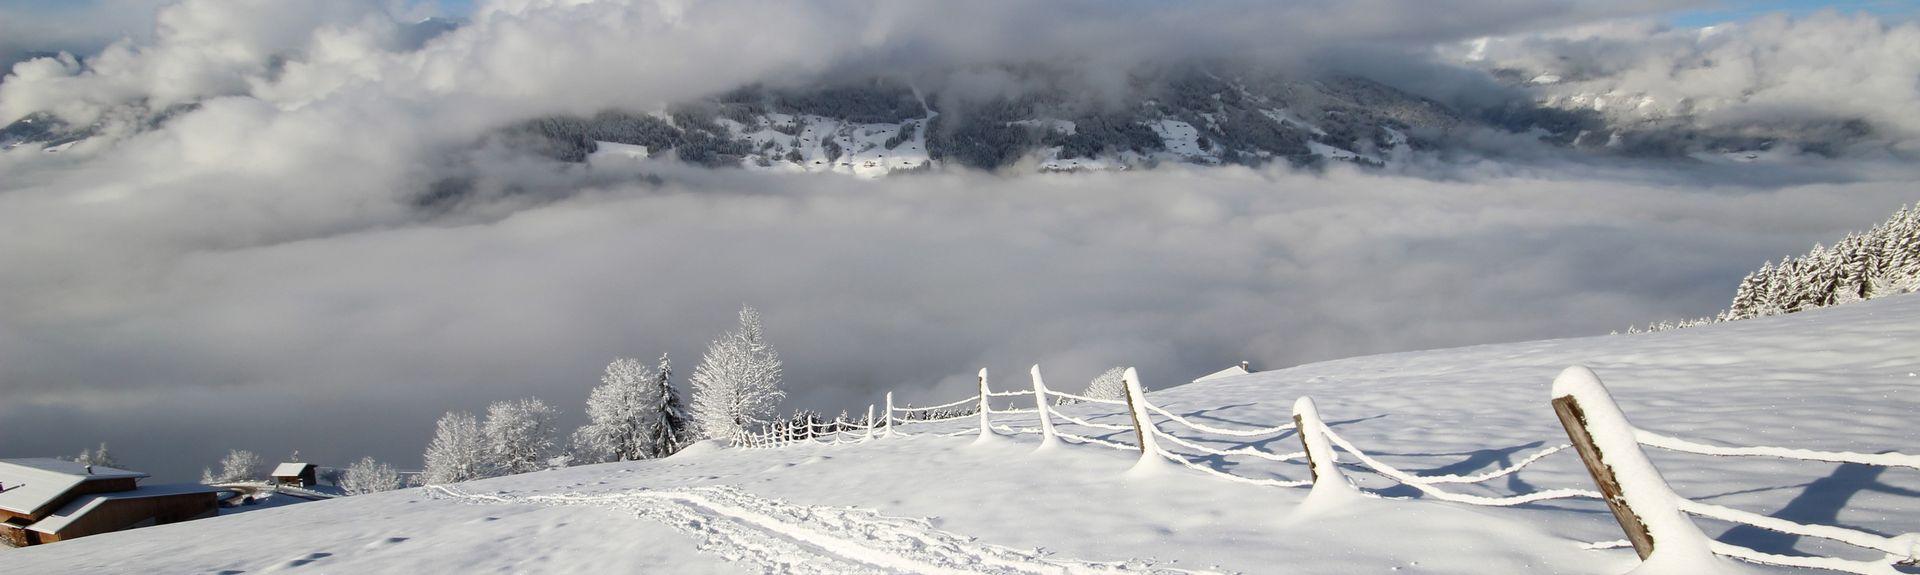 Palácio de Gelo da Natureza, Finkenberg, Tyrol, Áustria